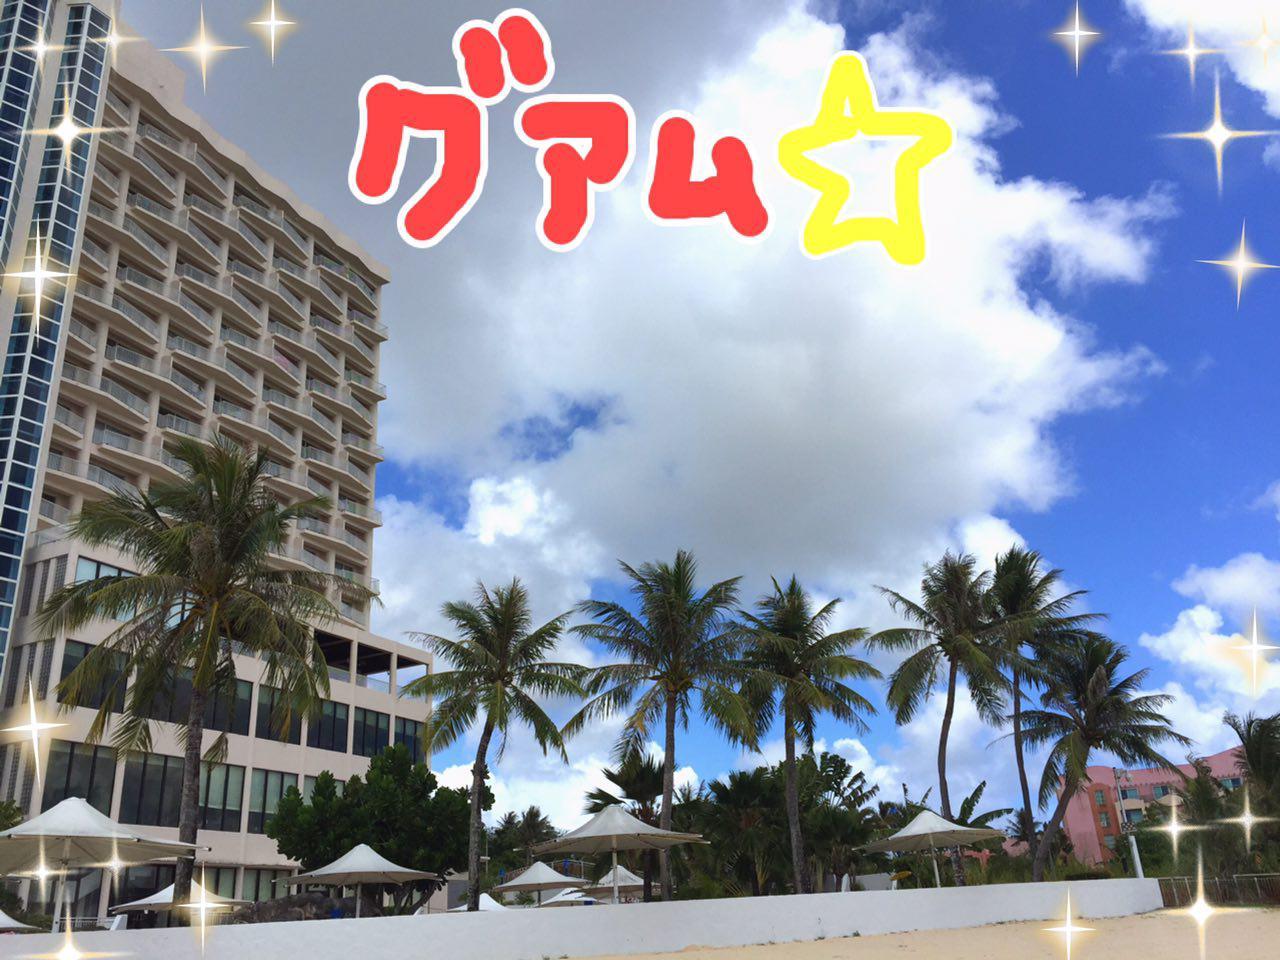 photo_2017-06-06_22-31-30.jpg